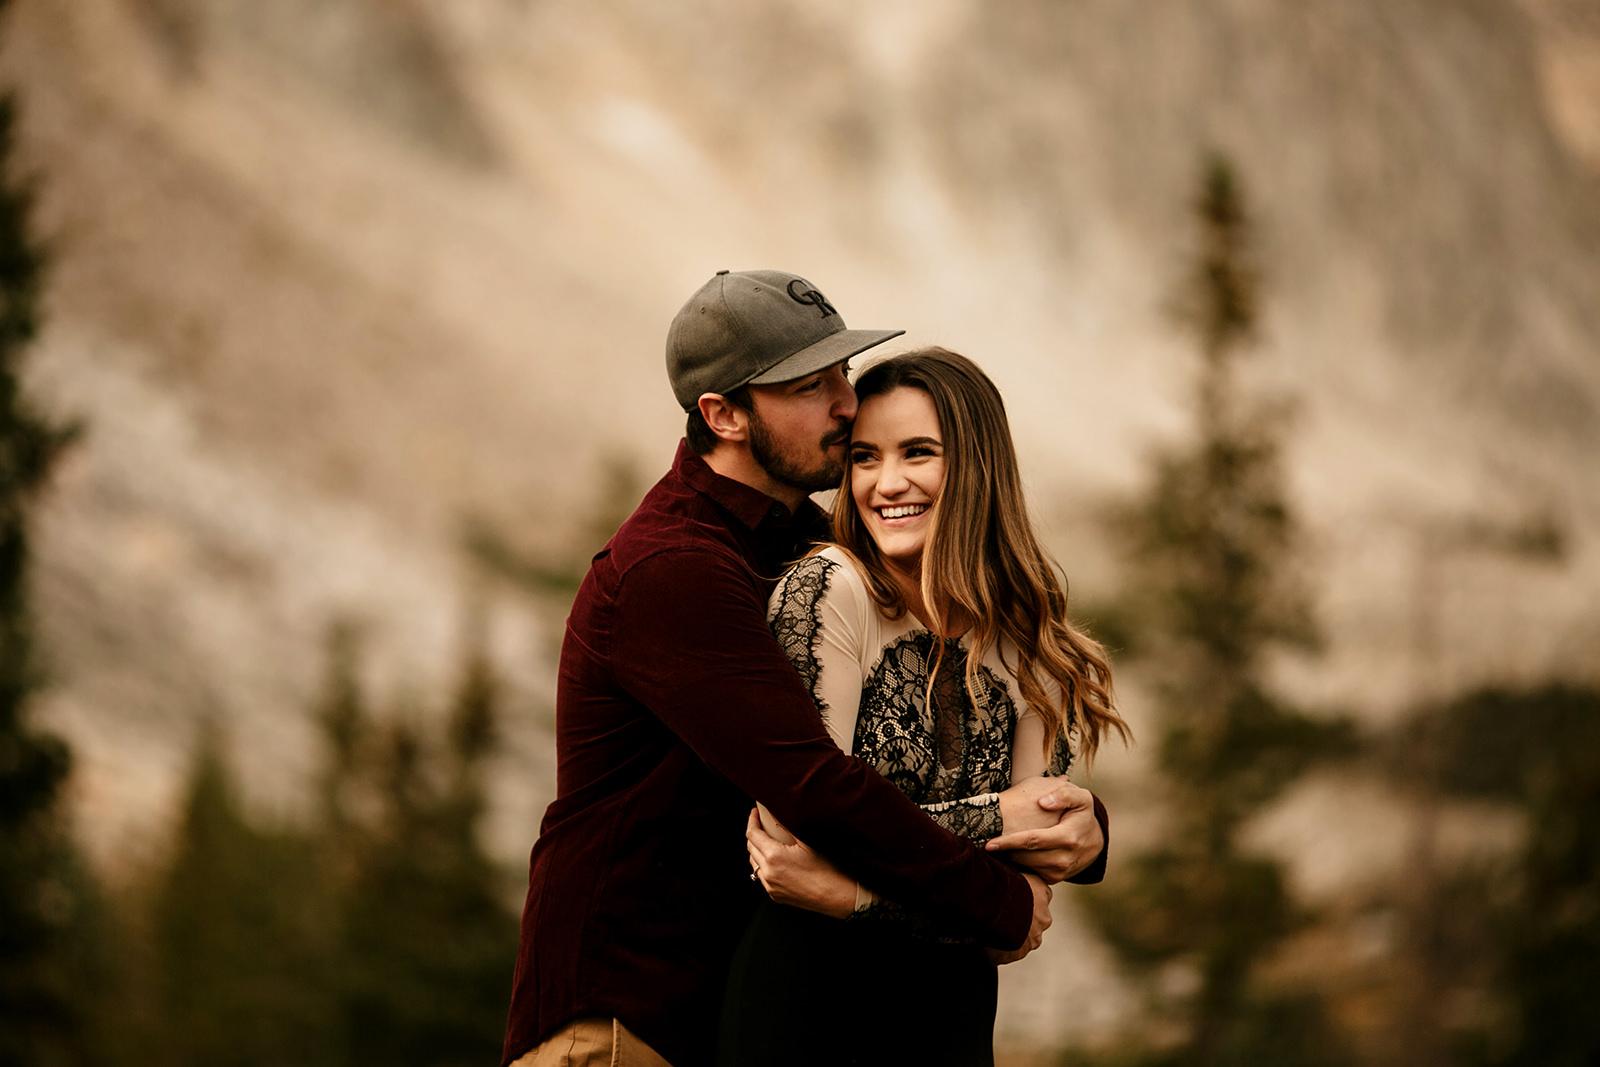 Liz Osban Photography Cheyenne Wyoming Engagement Wedding Photographer couple adventure elopement wedding laramie denver fort collins colorado rocky mountain national park22.jpg